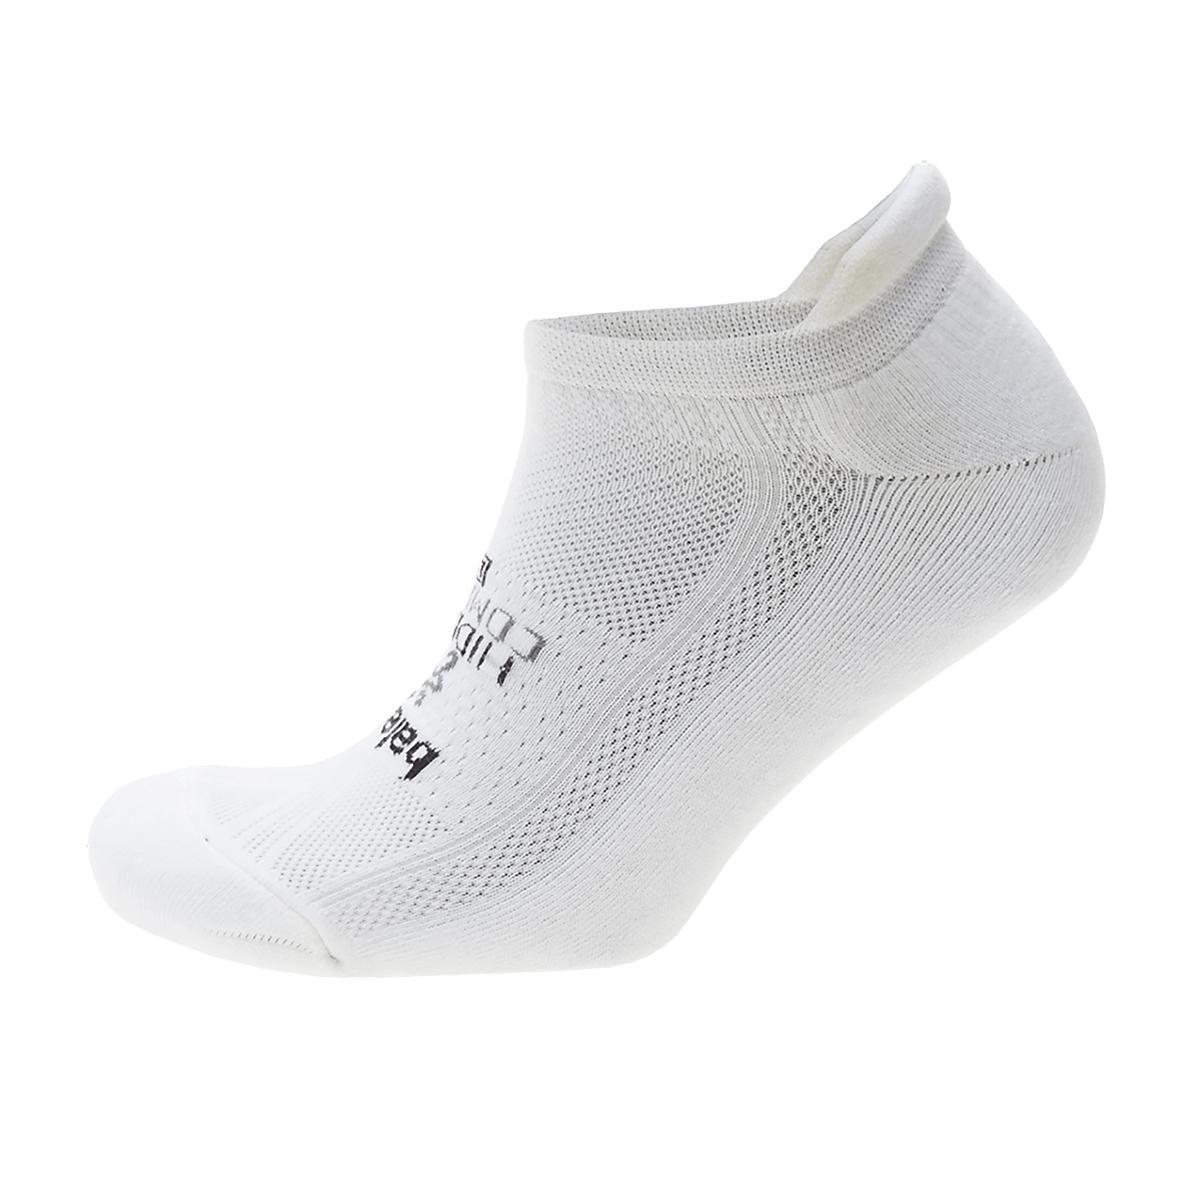 Balega Hidden Comfort Sock - Color: White Size: L